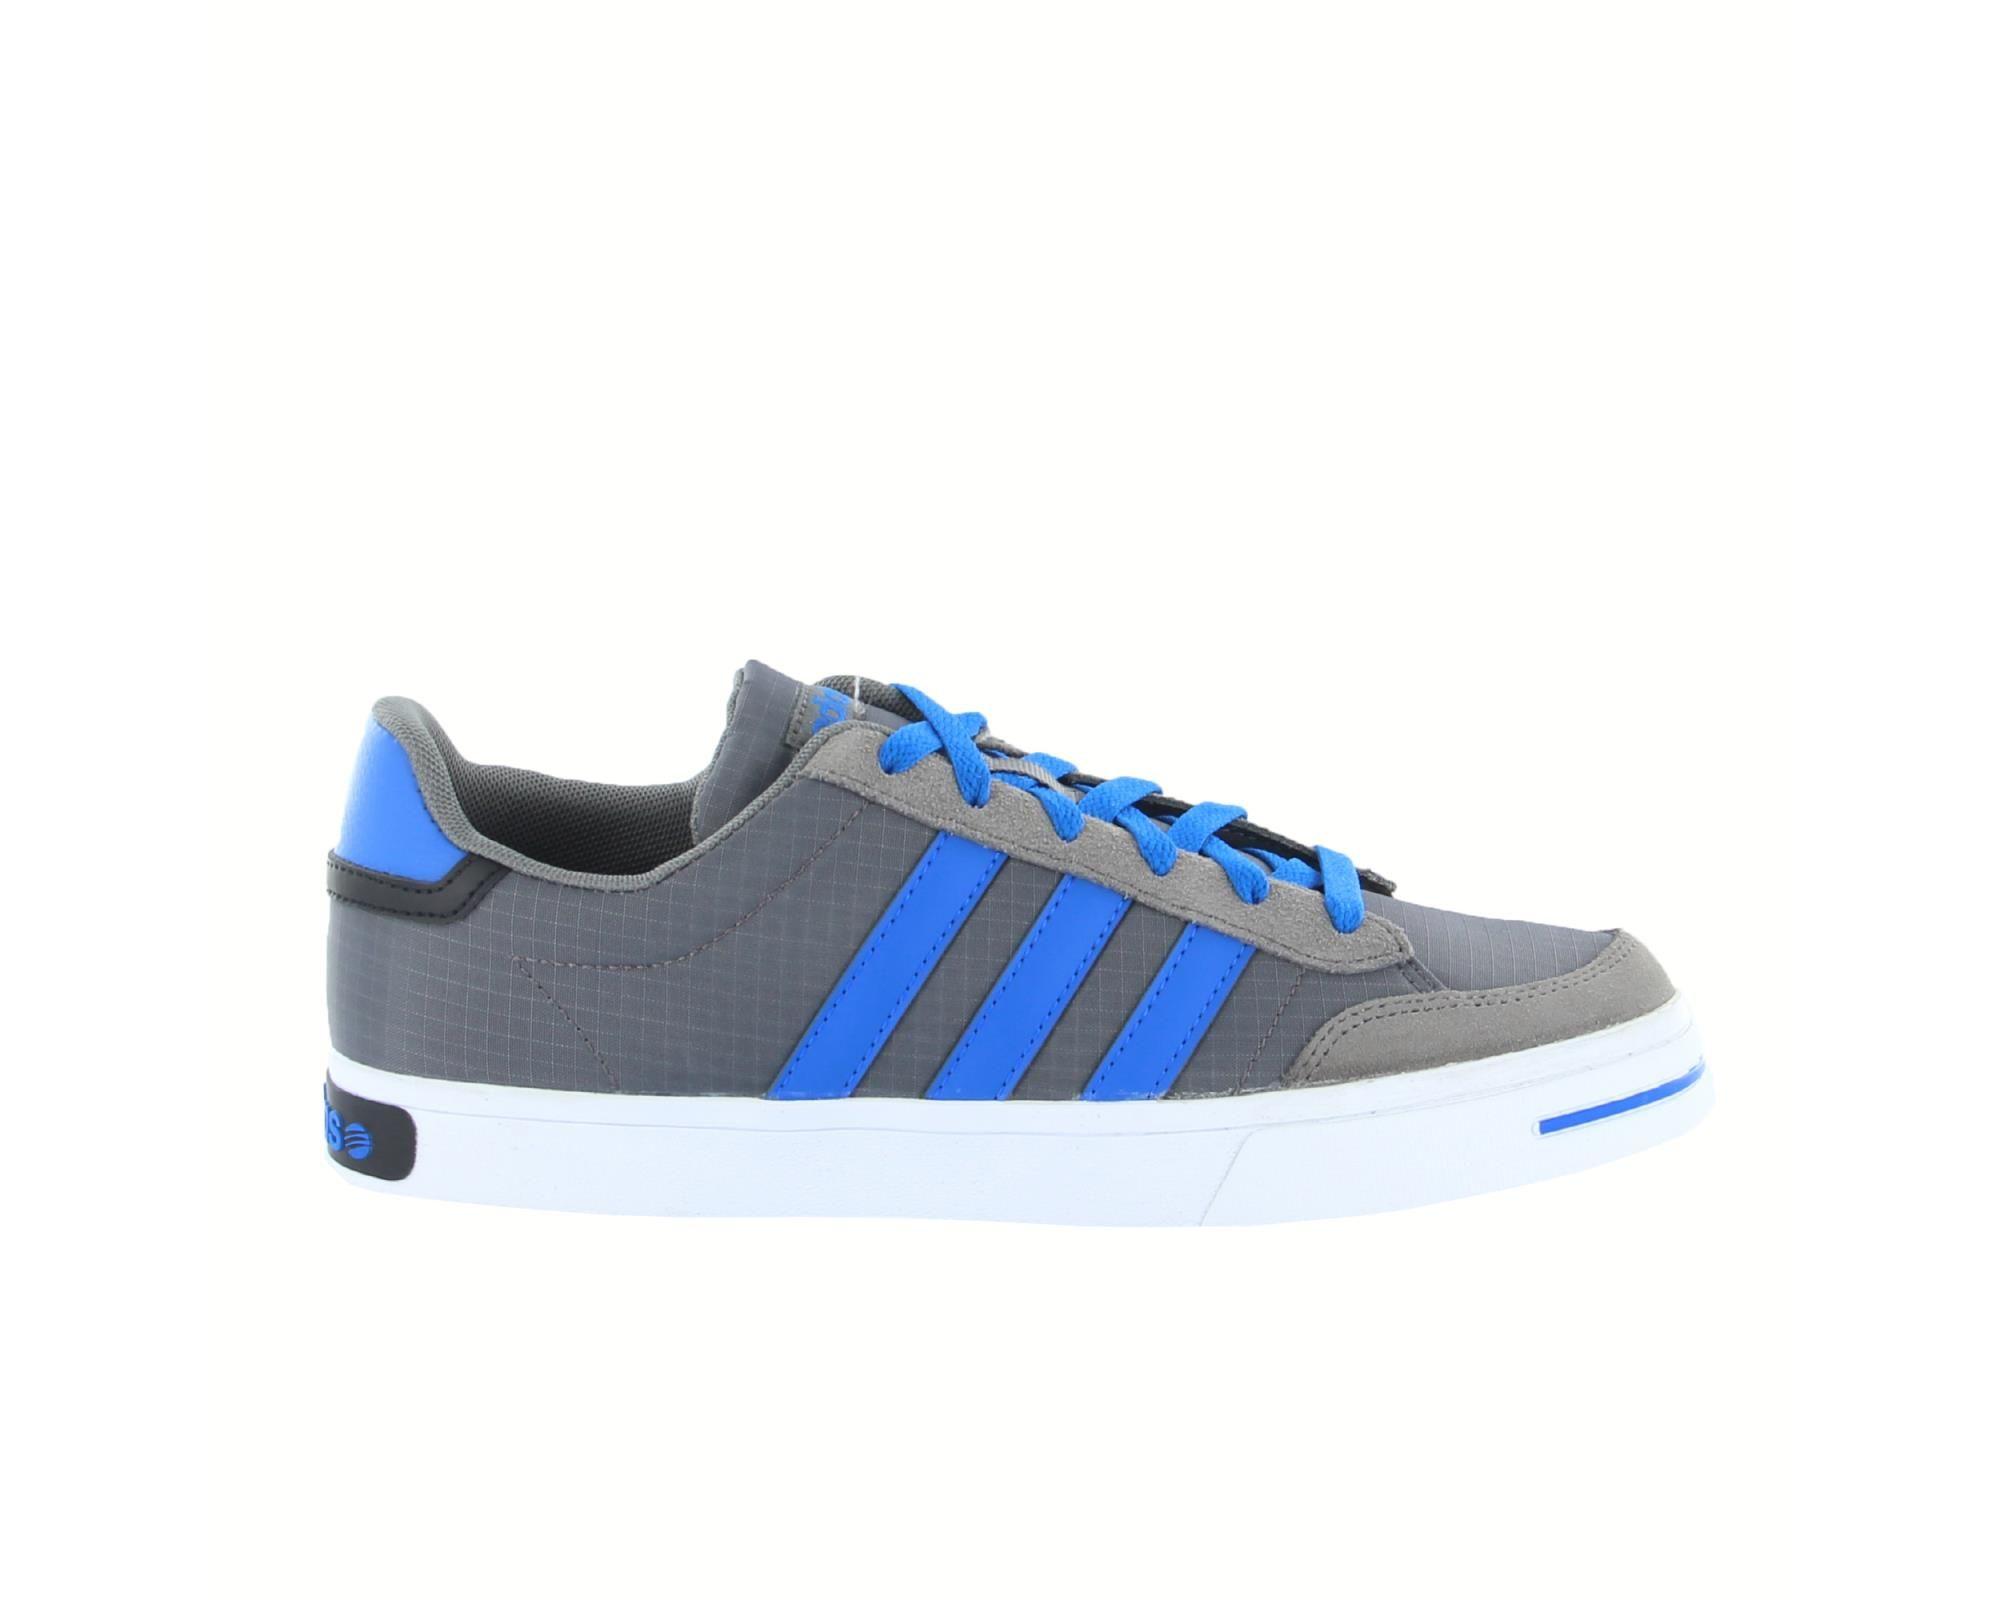 Adidas Neo Daily X